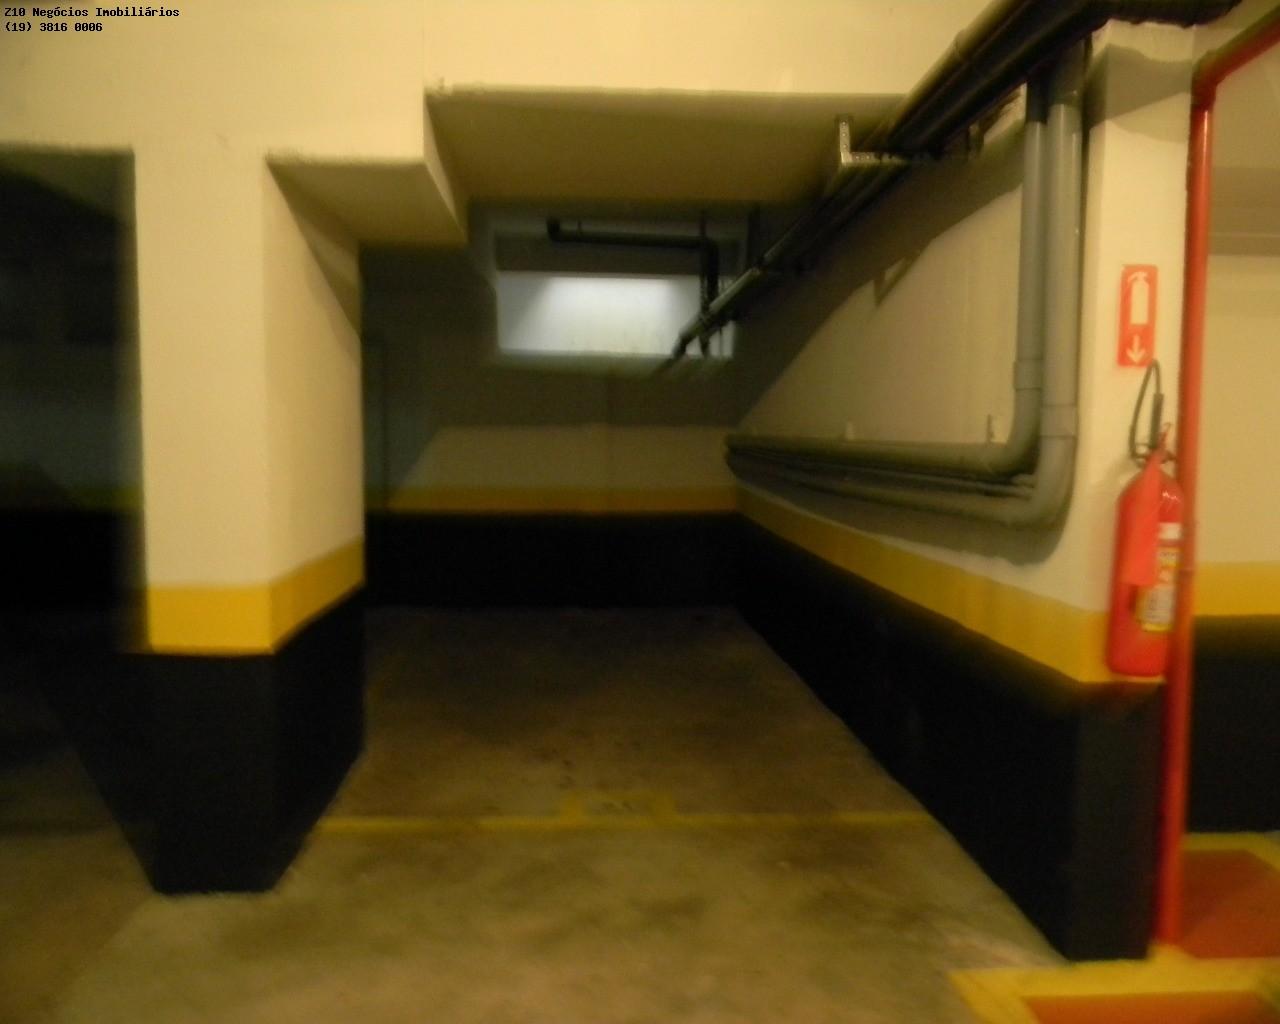 1 Vaga Garagem (prox elev)